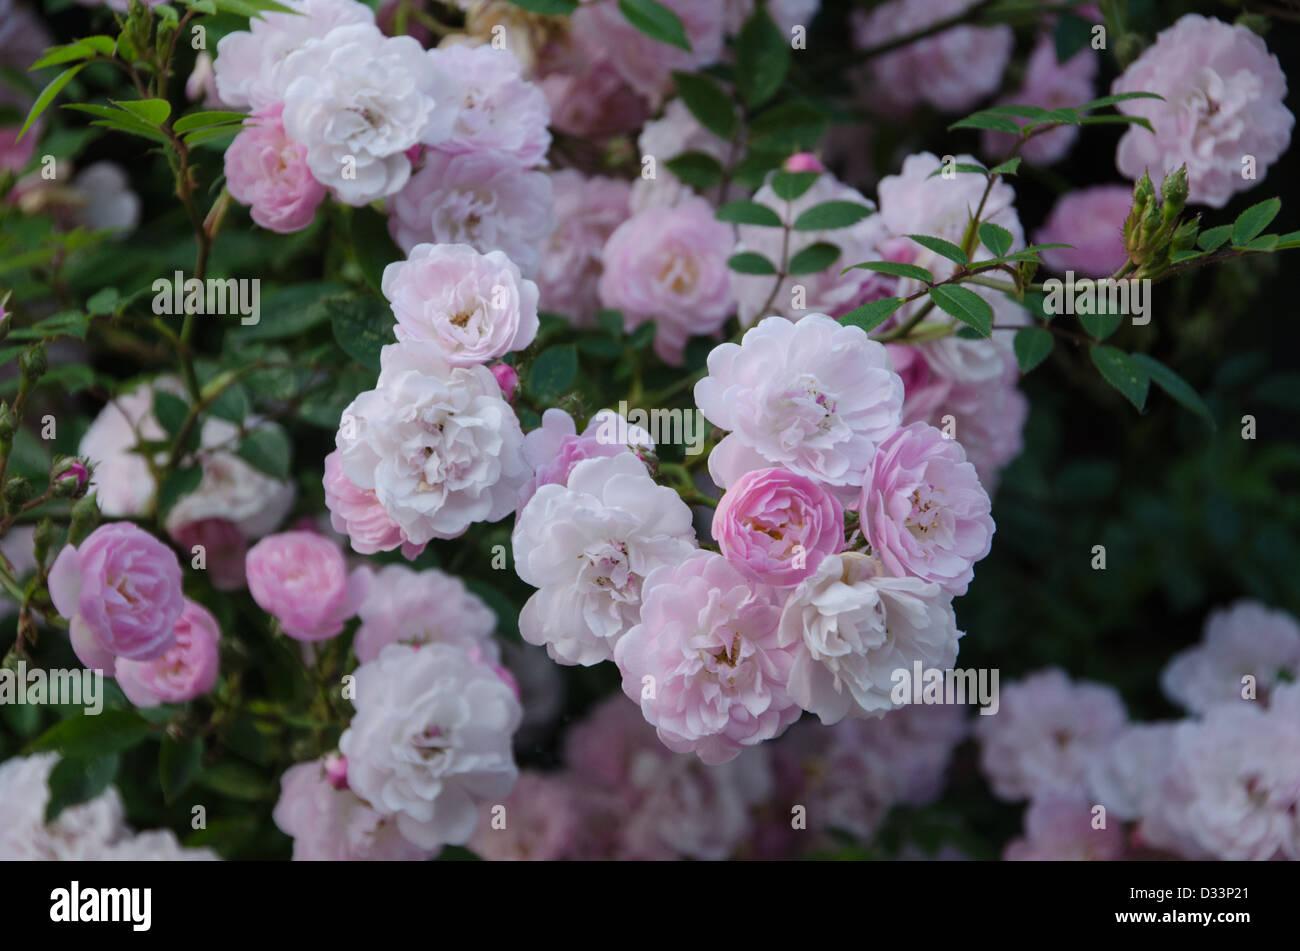 Climbing patio rose 'Little Rambler' Immagini Stock